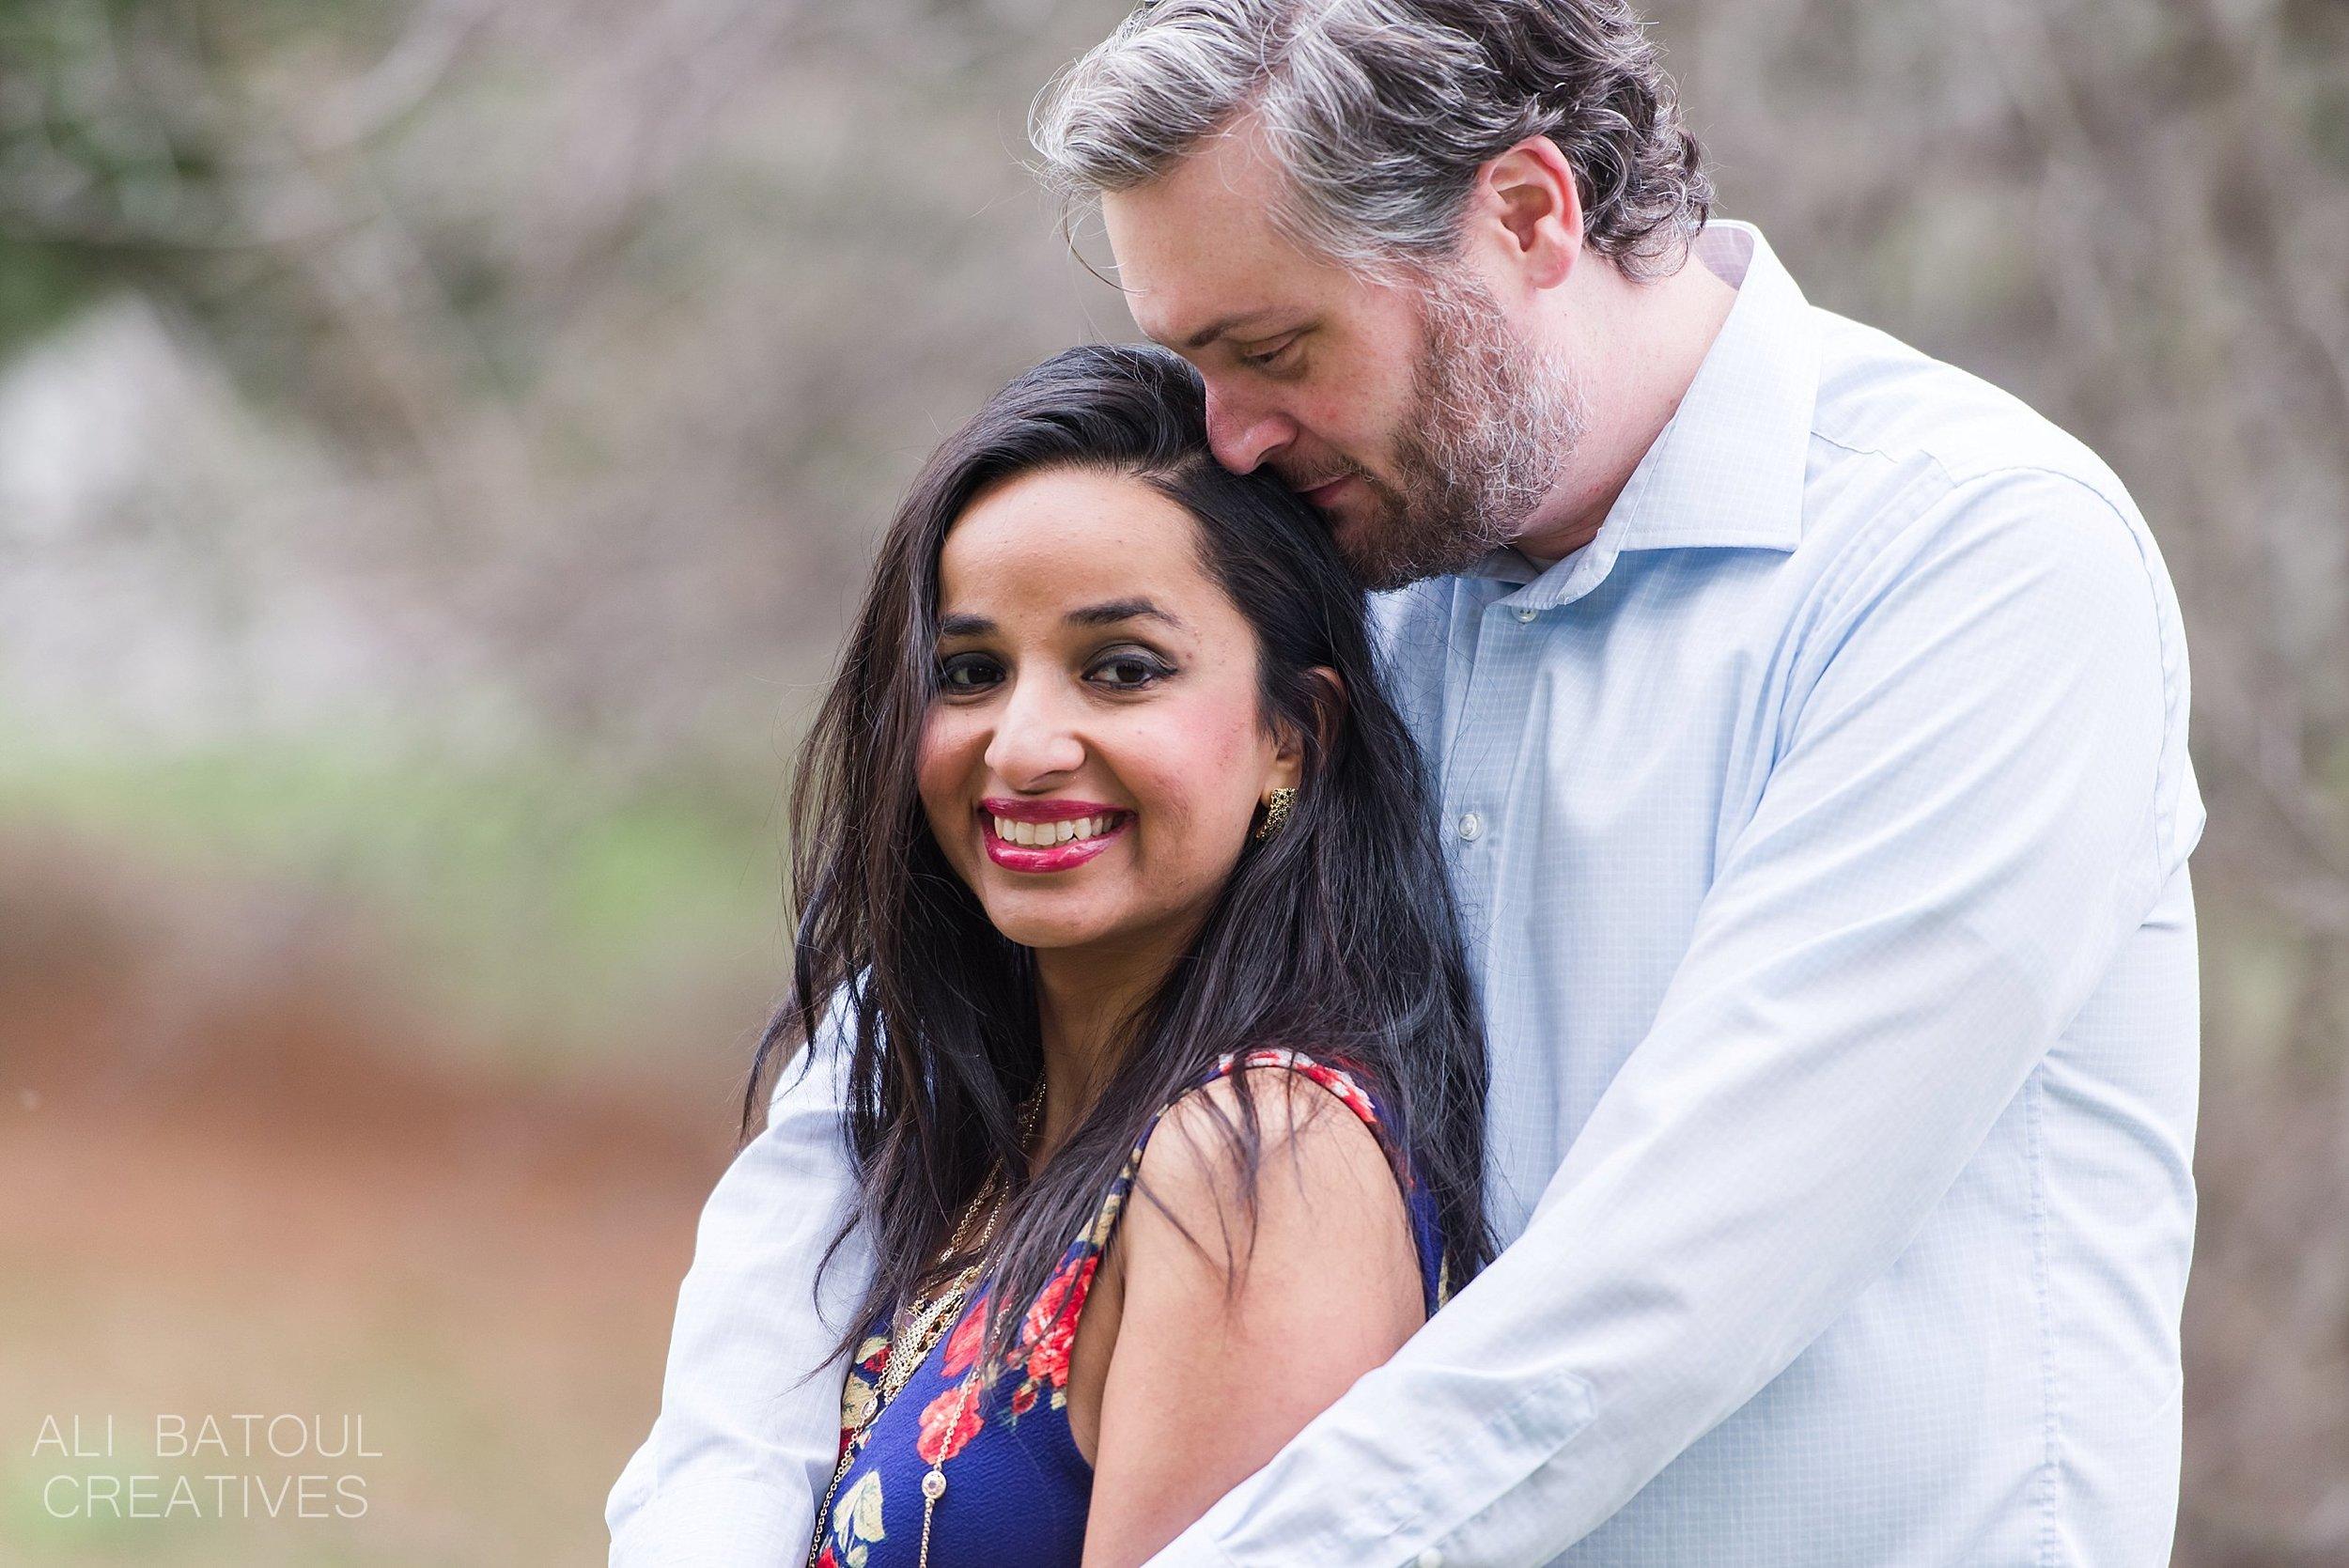 Uzma + Ian Engagement - Ali Batoul Creatives Fine Art Wedding Photography_0195.jpg